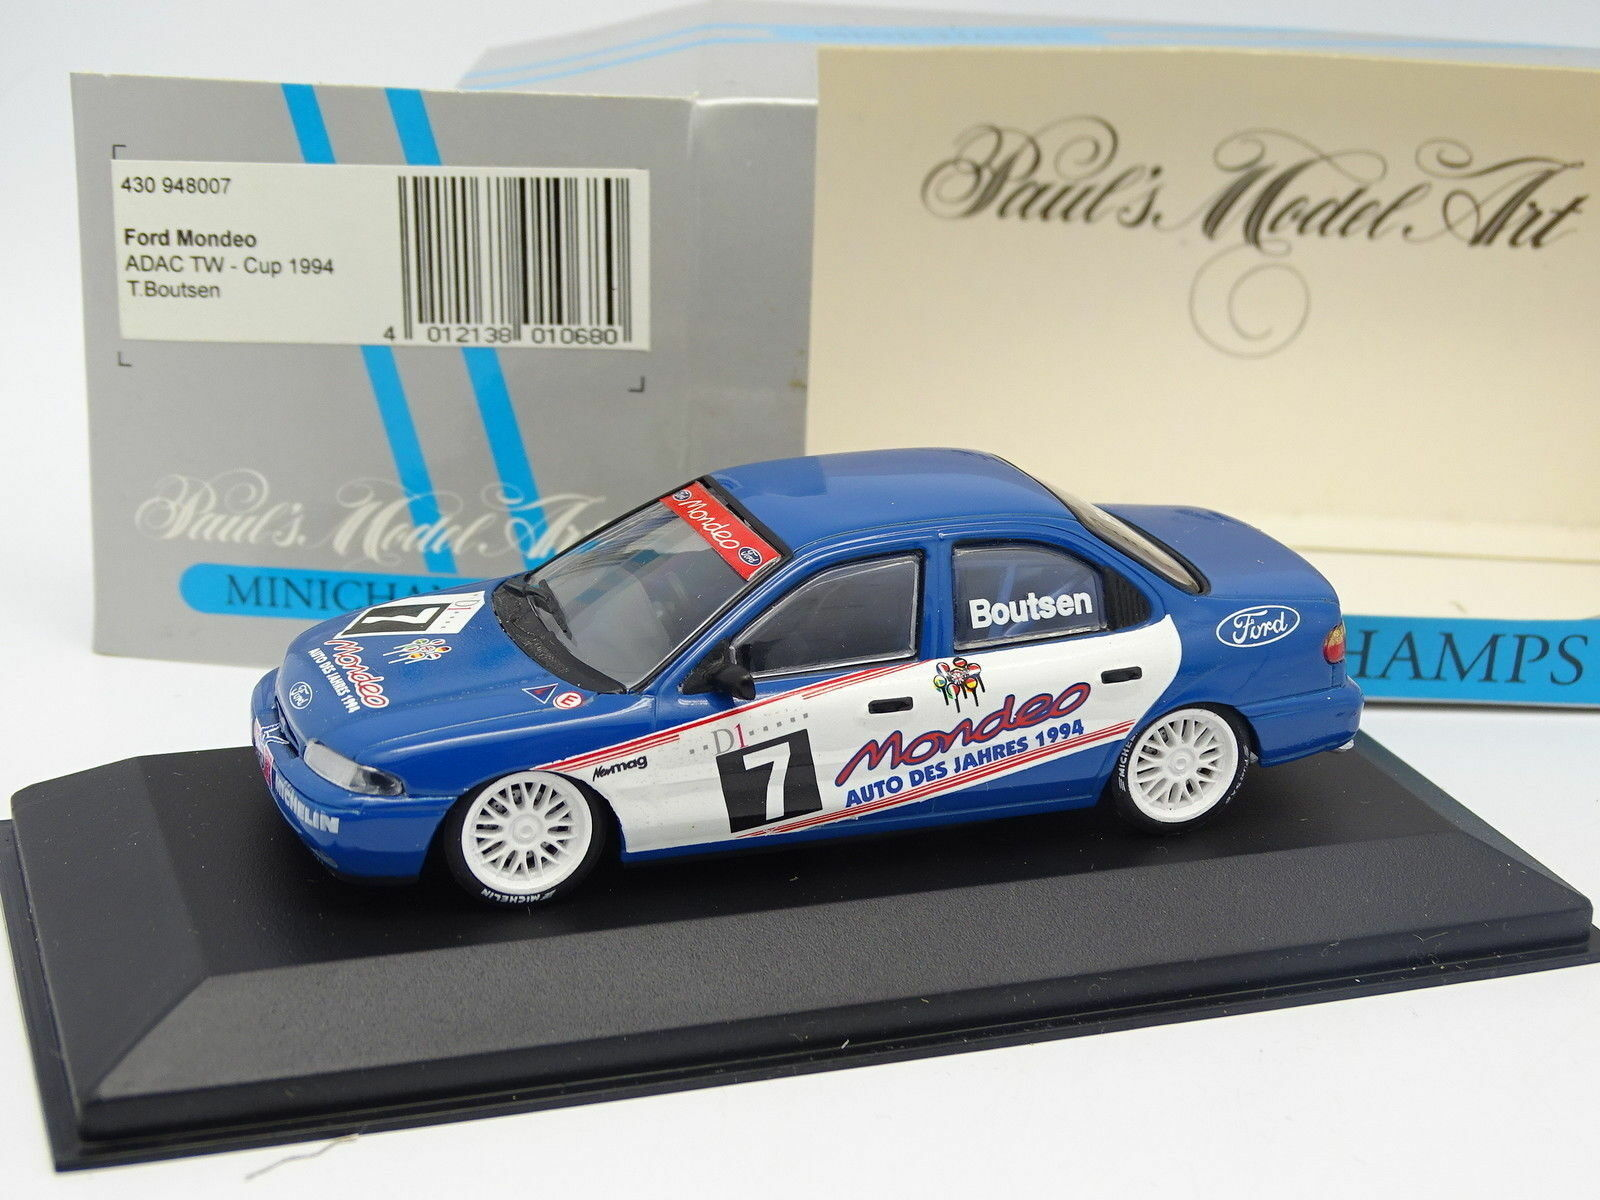 Minichamps 1/43 - Ford Mondeo ADAC TW Coppa 1994 Boutsen